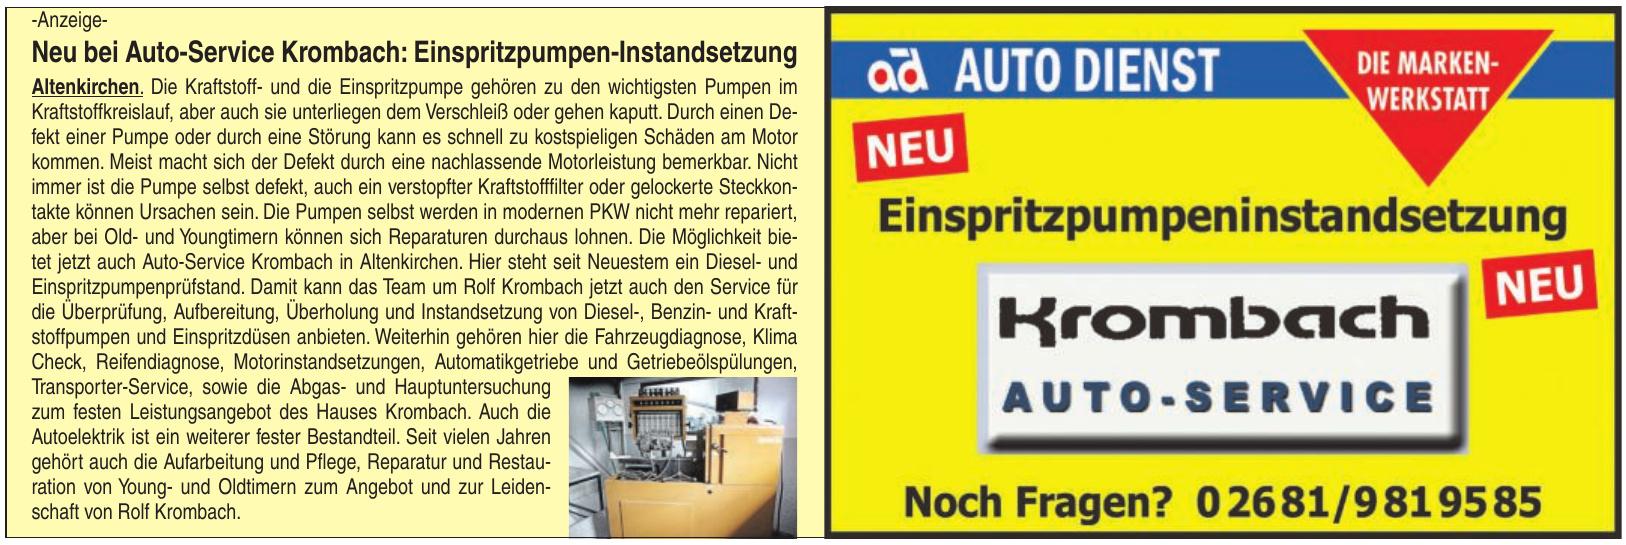 Auto-Service Krombach